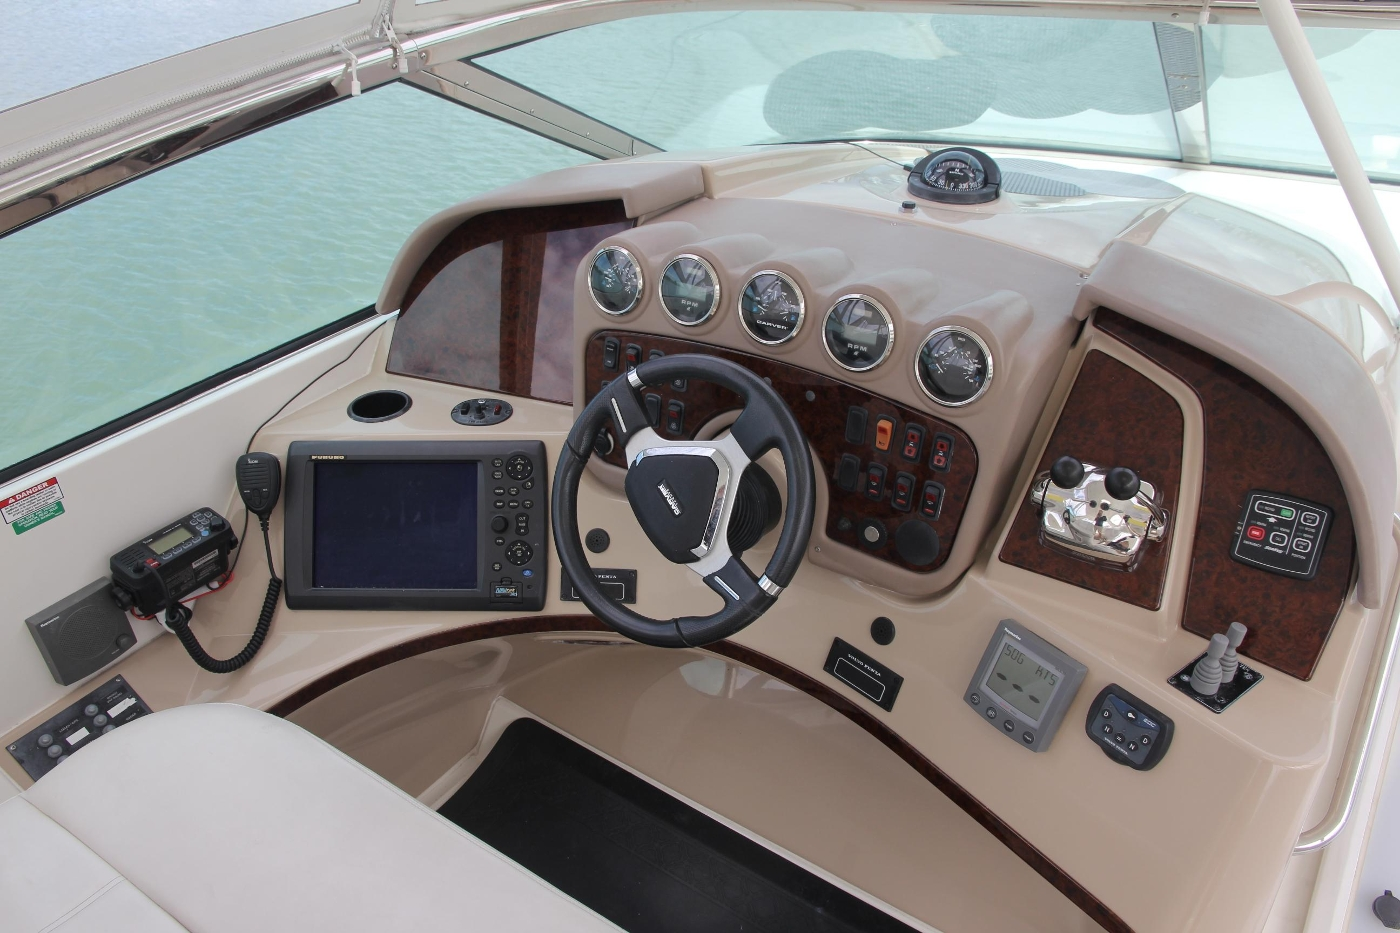 2005 Carver 560 Voyager Pilothouse, Helm Controls